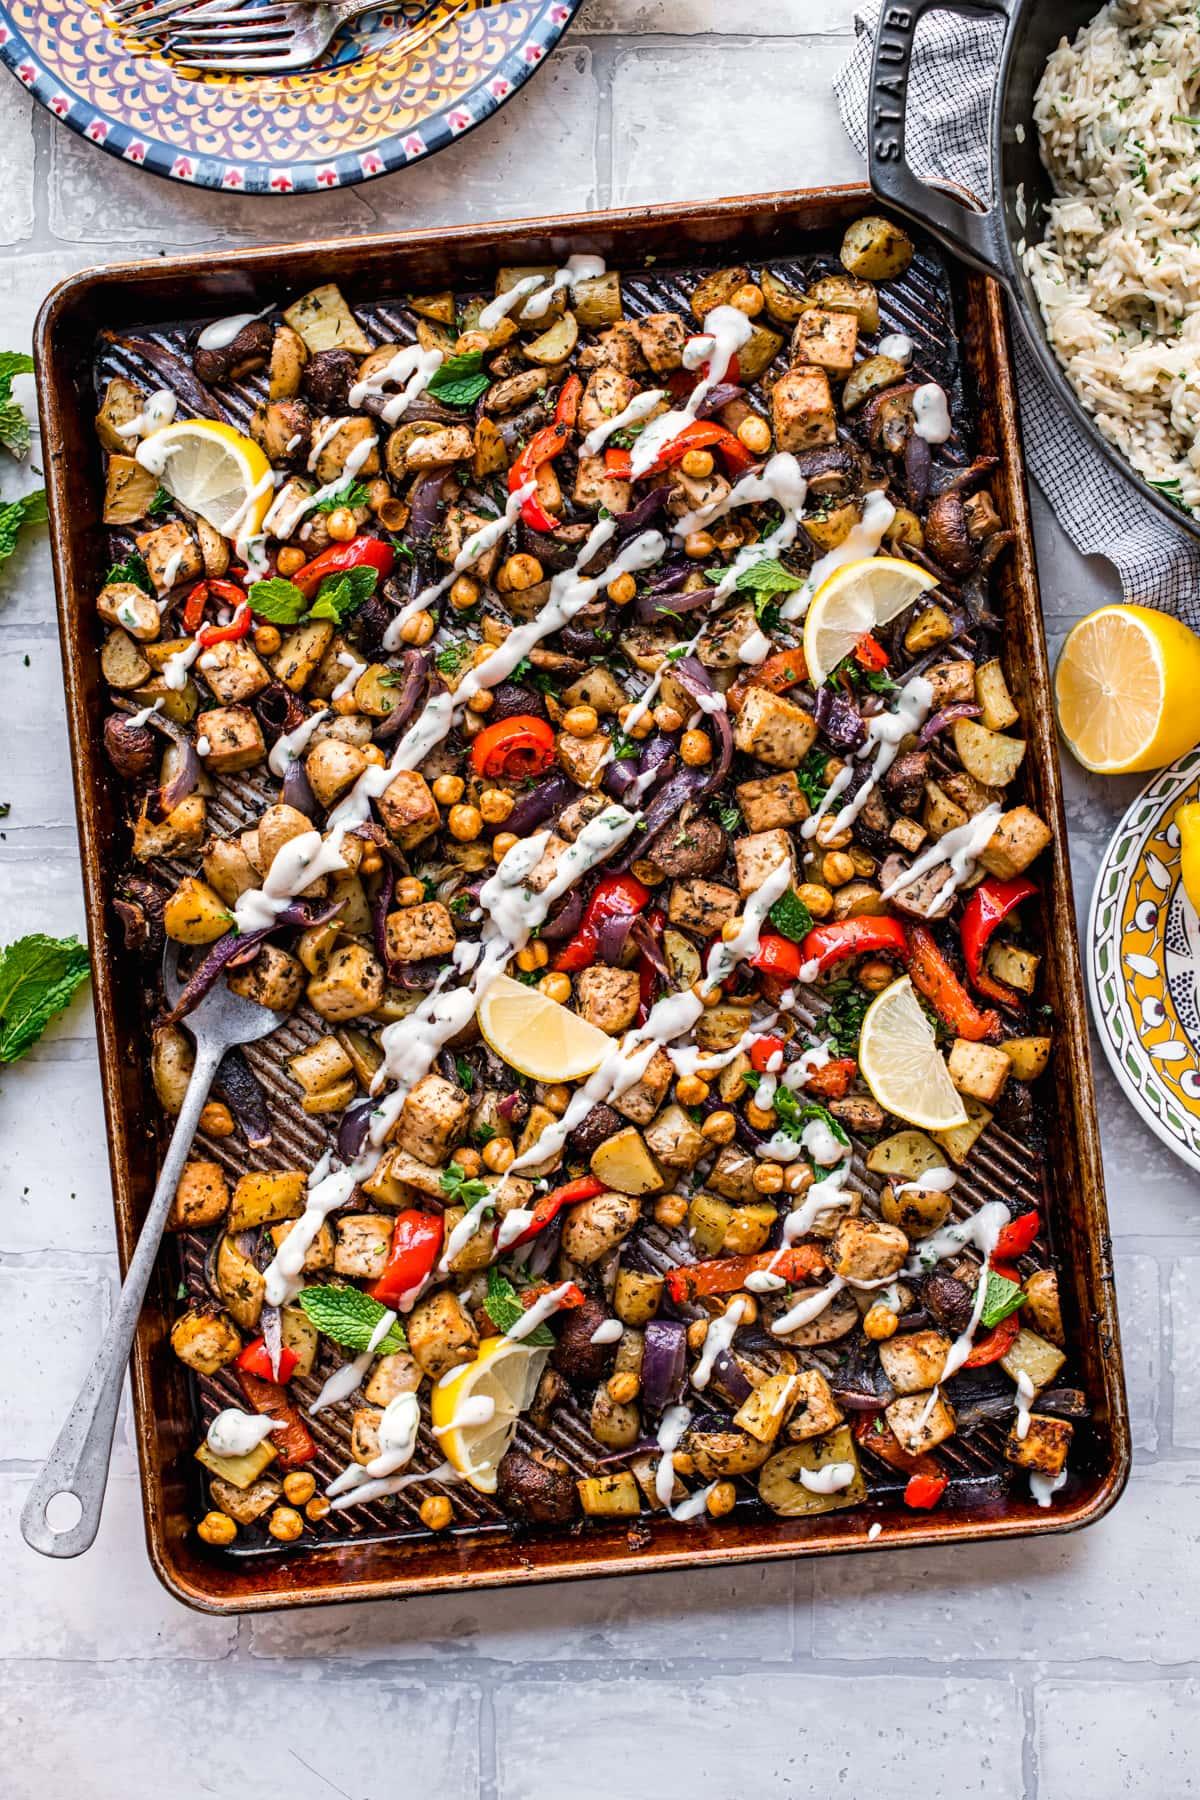 overhead view of vegan mediterranean sheet pan dinner with tofu, chickpeas, vegetables and tahini yogurt drizzle.